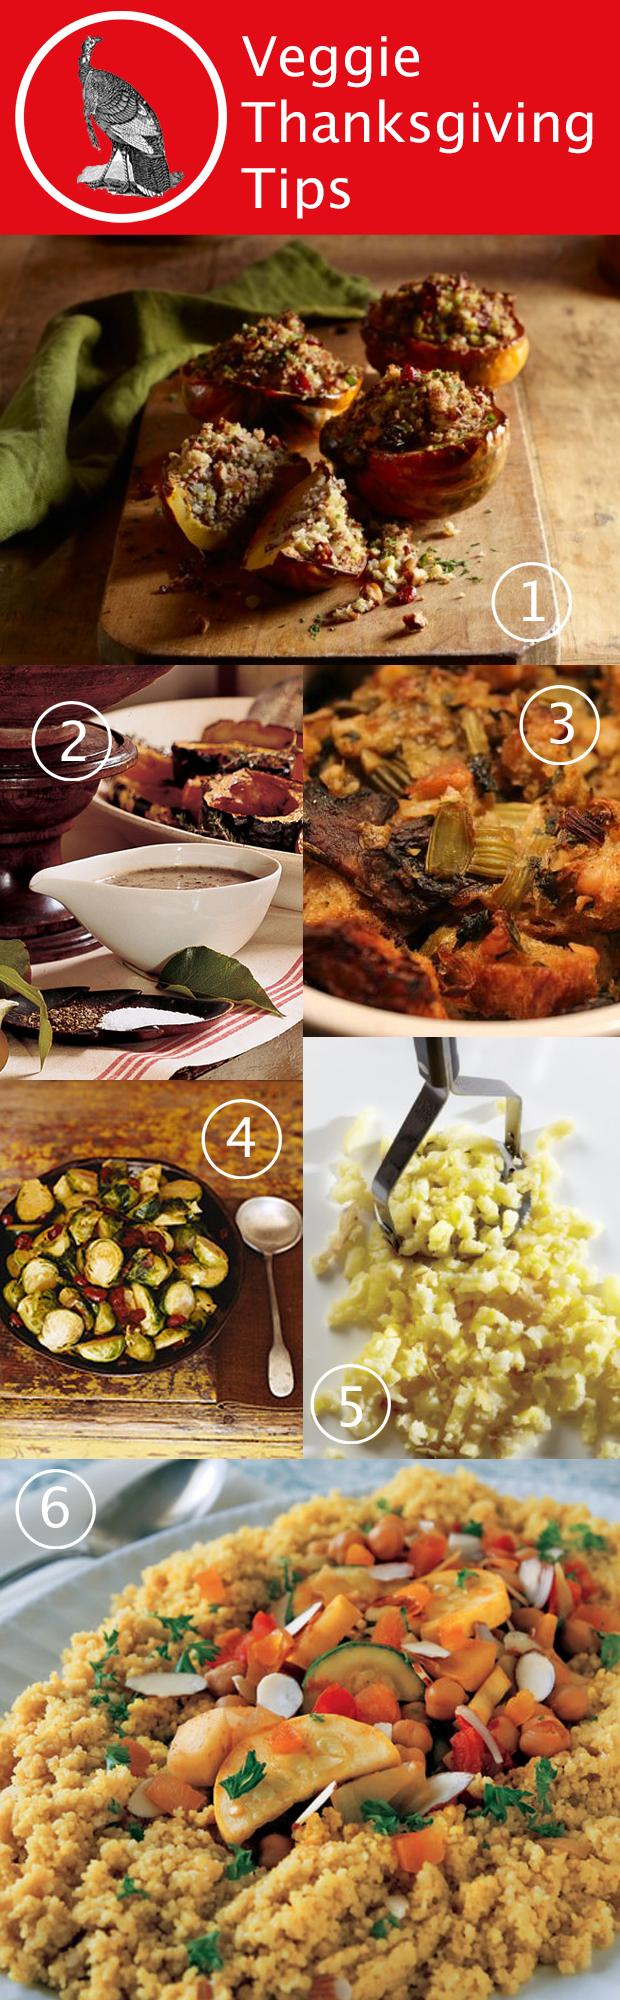 Vegetarian Thanksgiving Tips & Ideas | HandsOccupied.com